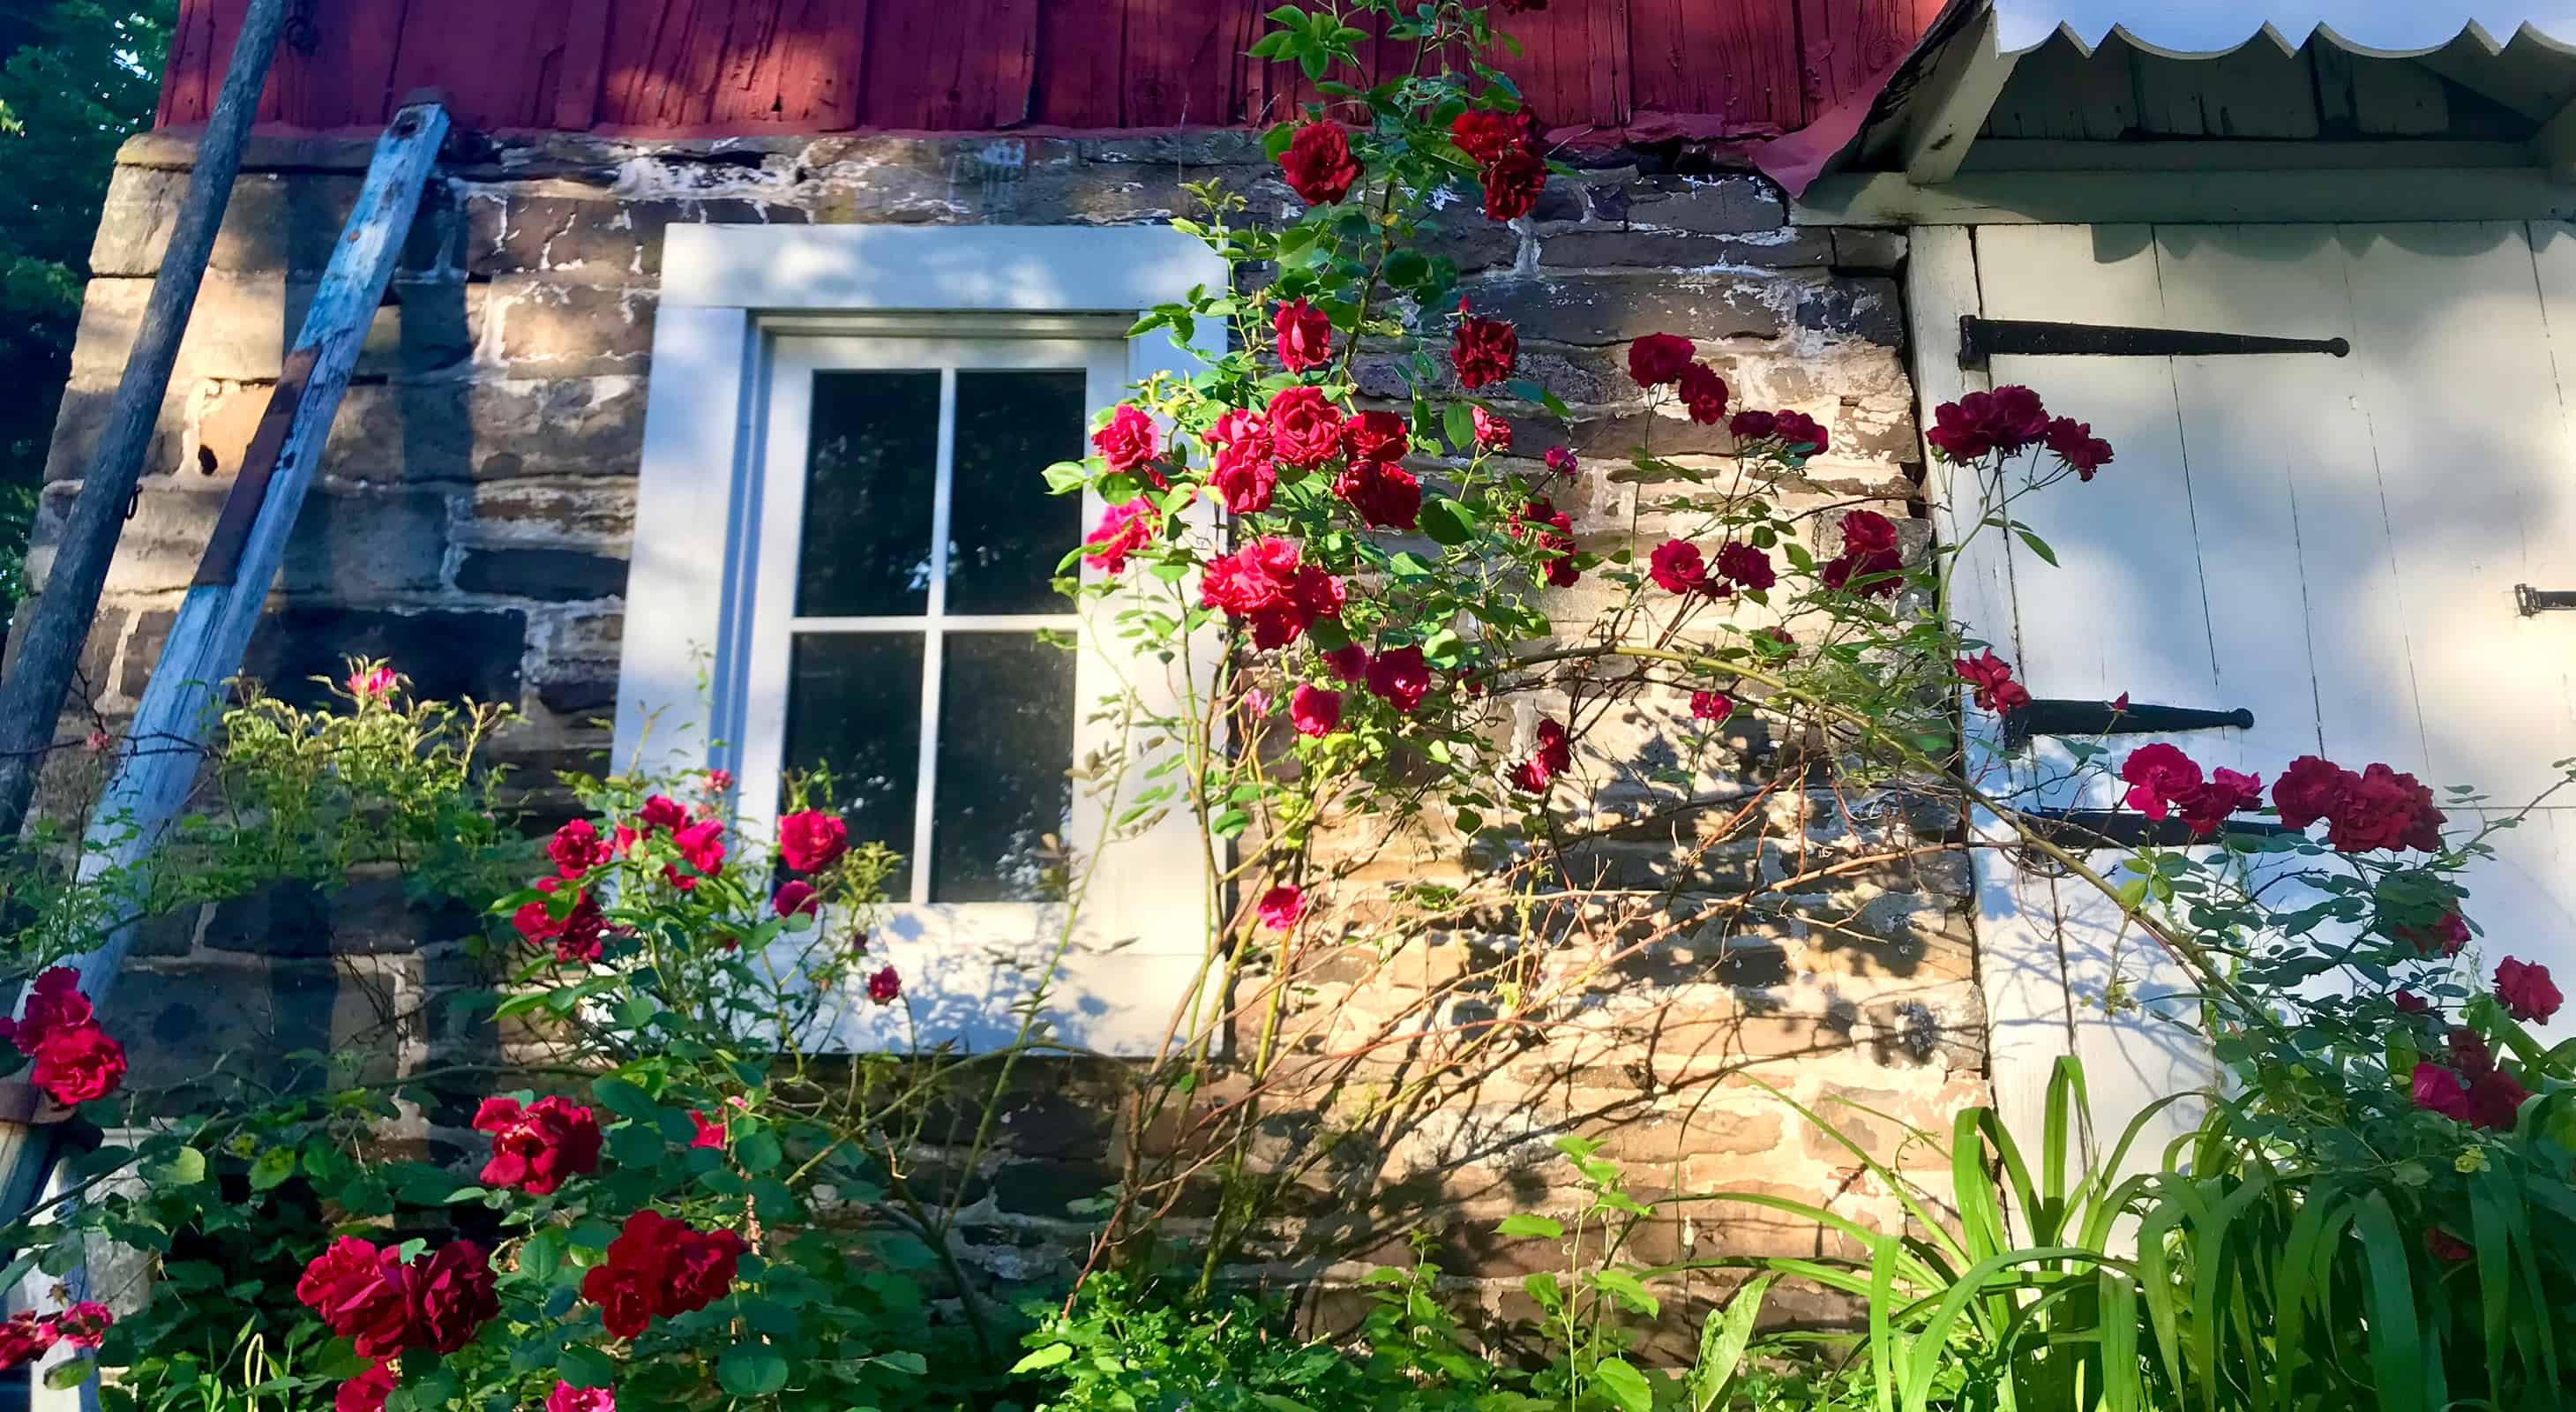 Springtime Flowers at Galvanized America Inn